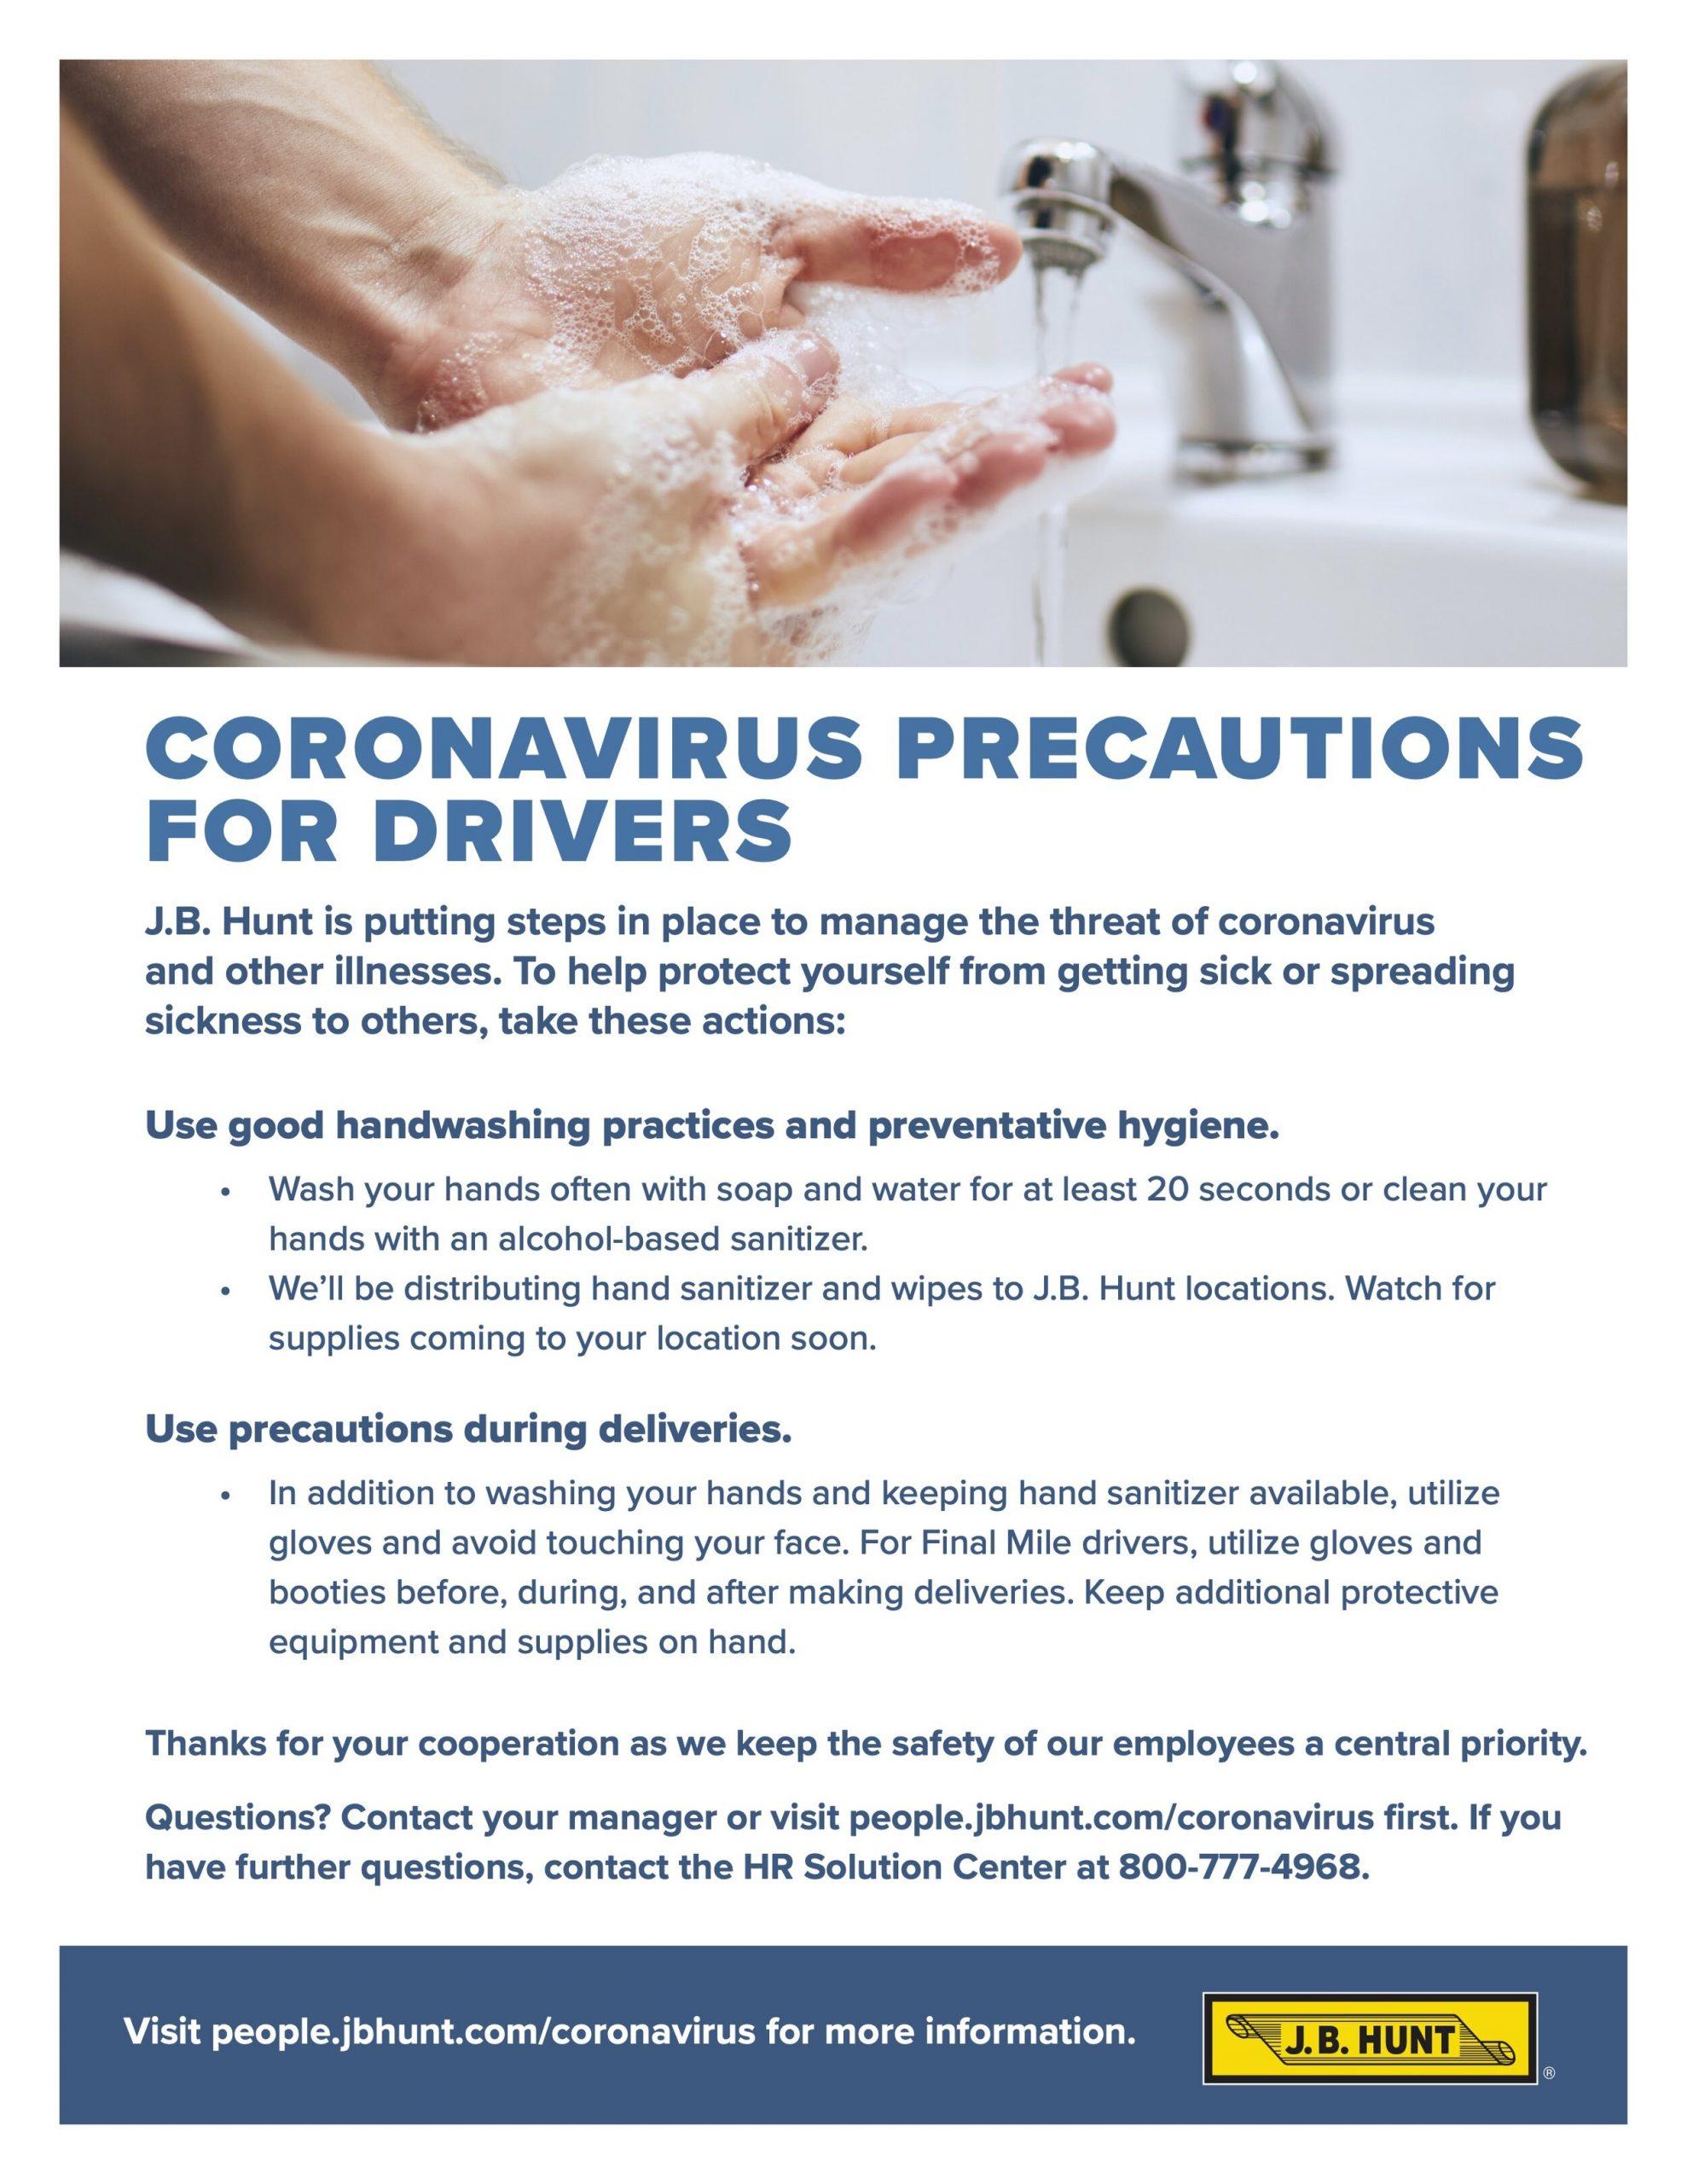 covid_jbhunt_Coronavirus+Precautions_Flyer